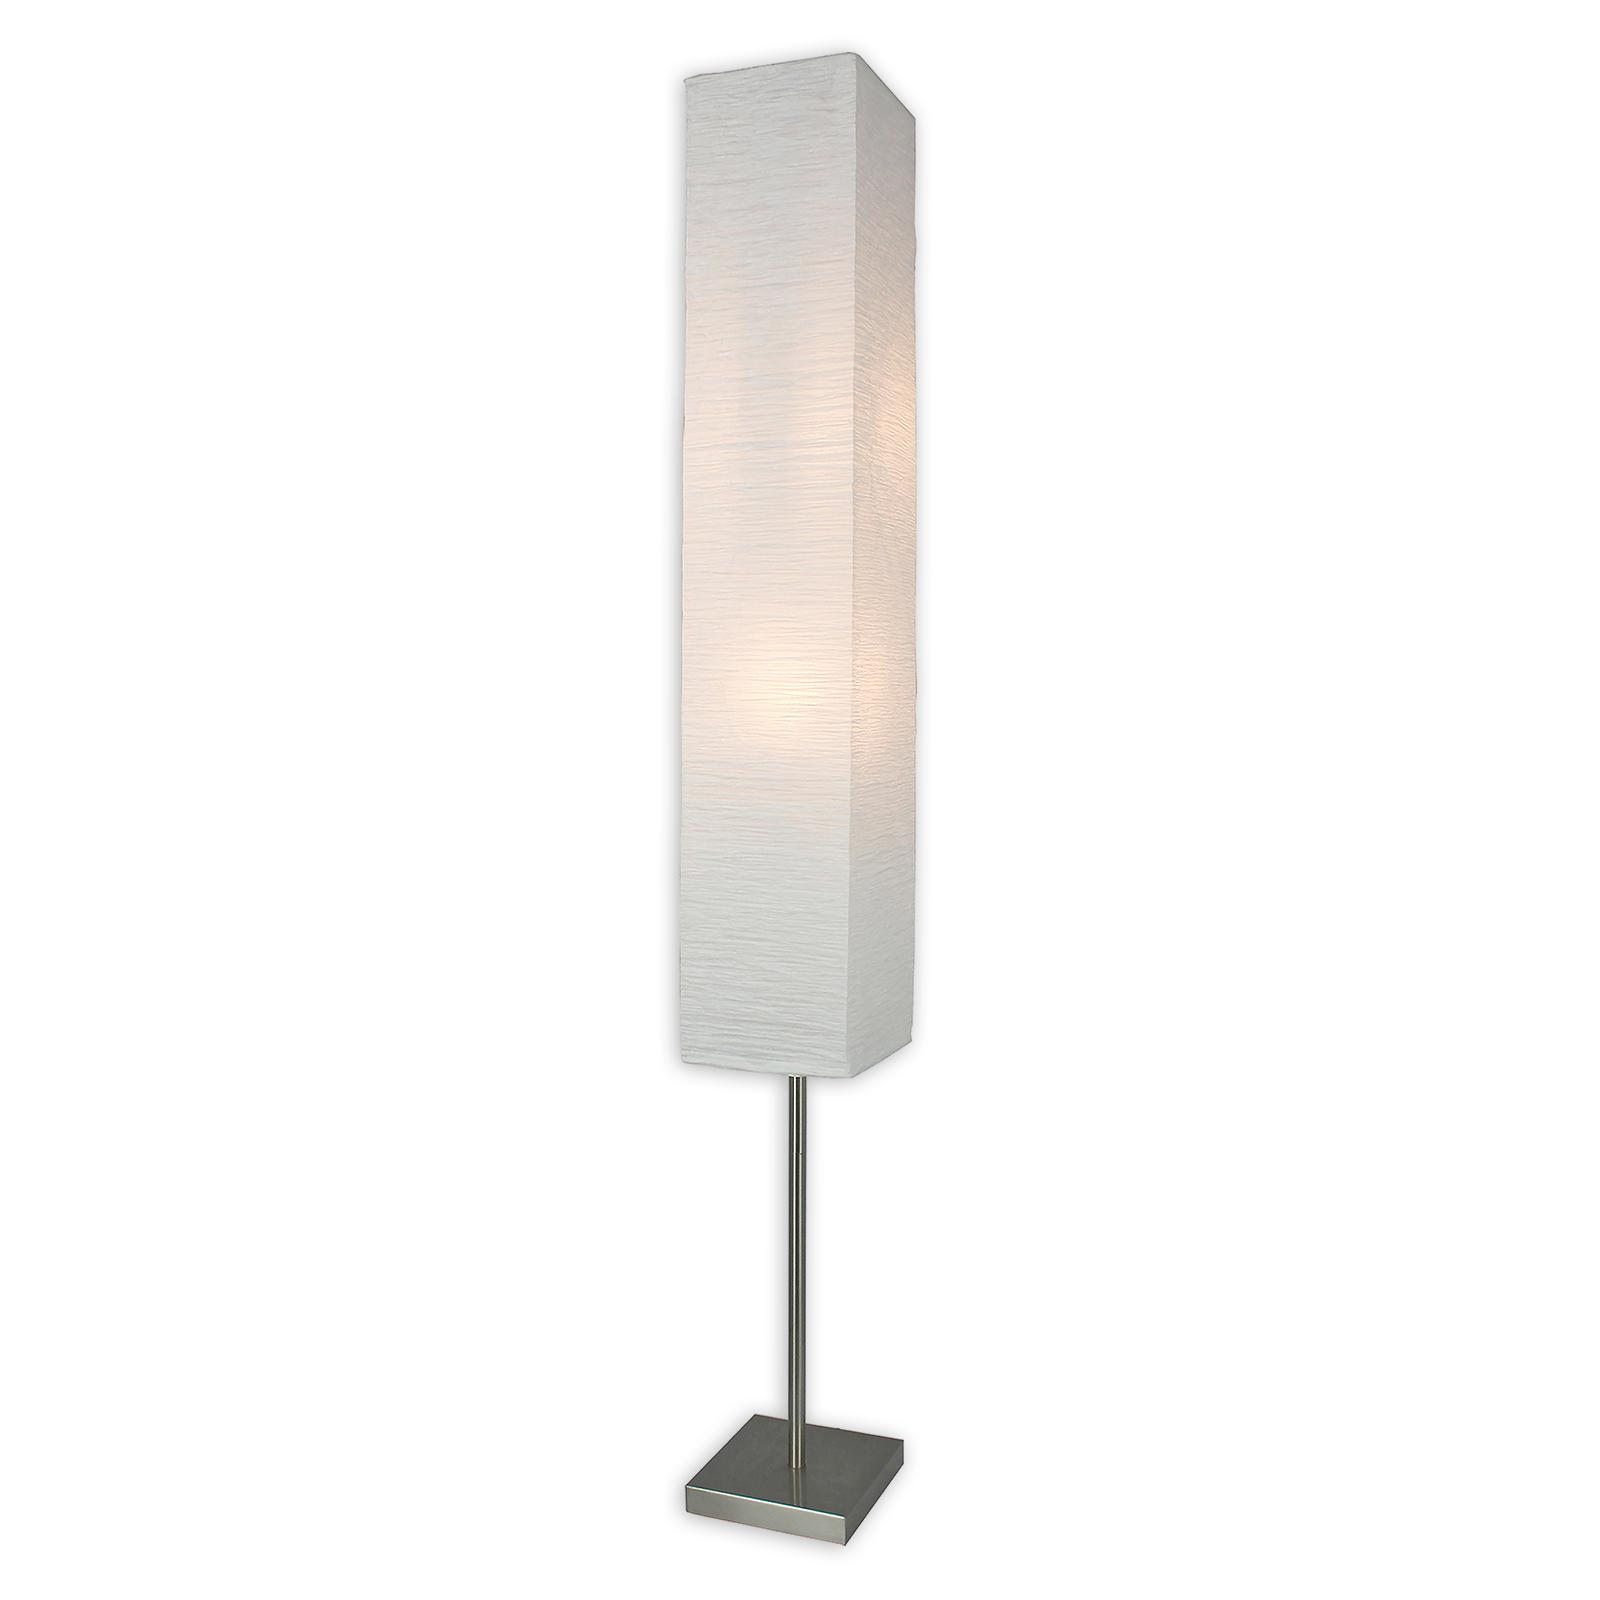 Stehlampe Papier Metall 2 X E14 Online Bei Roller Kaufen